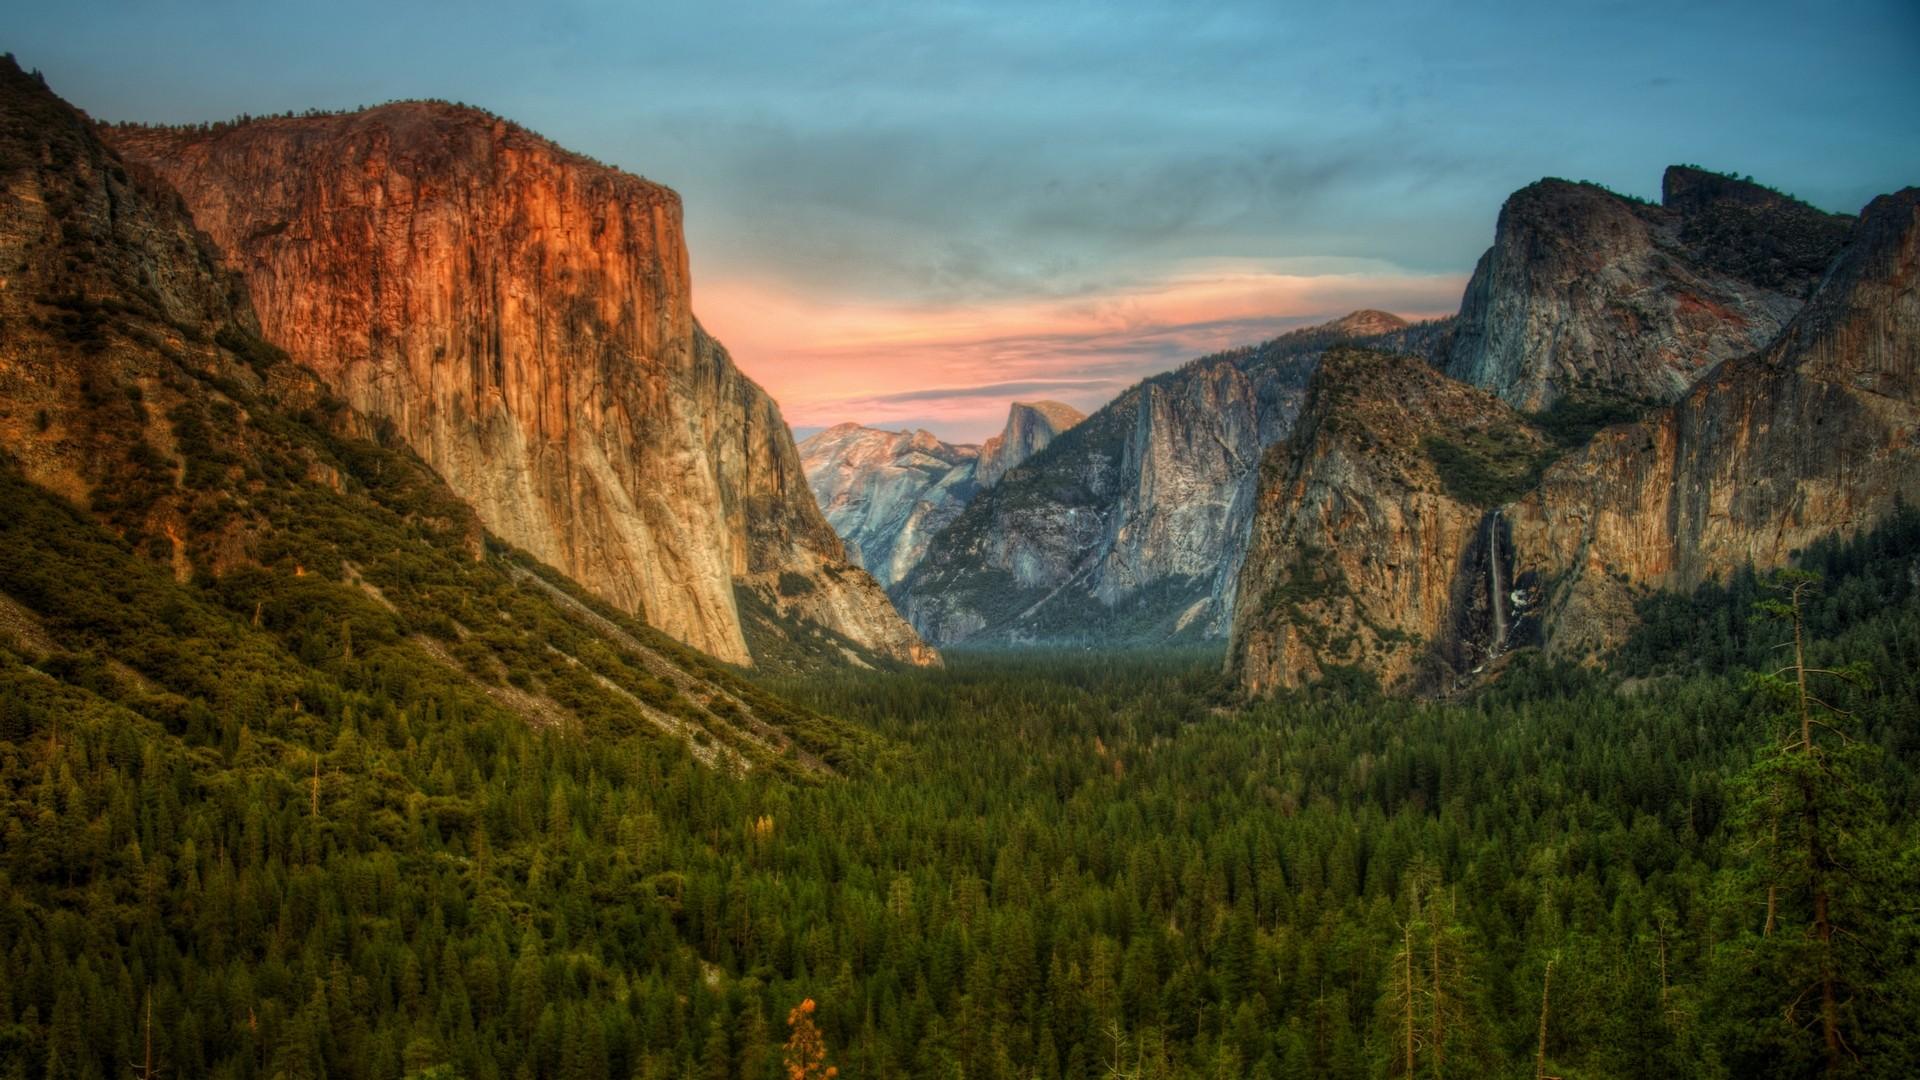 General 1920x1080 landscape nature Yosemite National Park Yosemite Valley